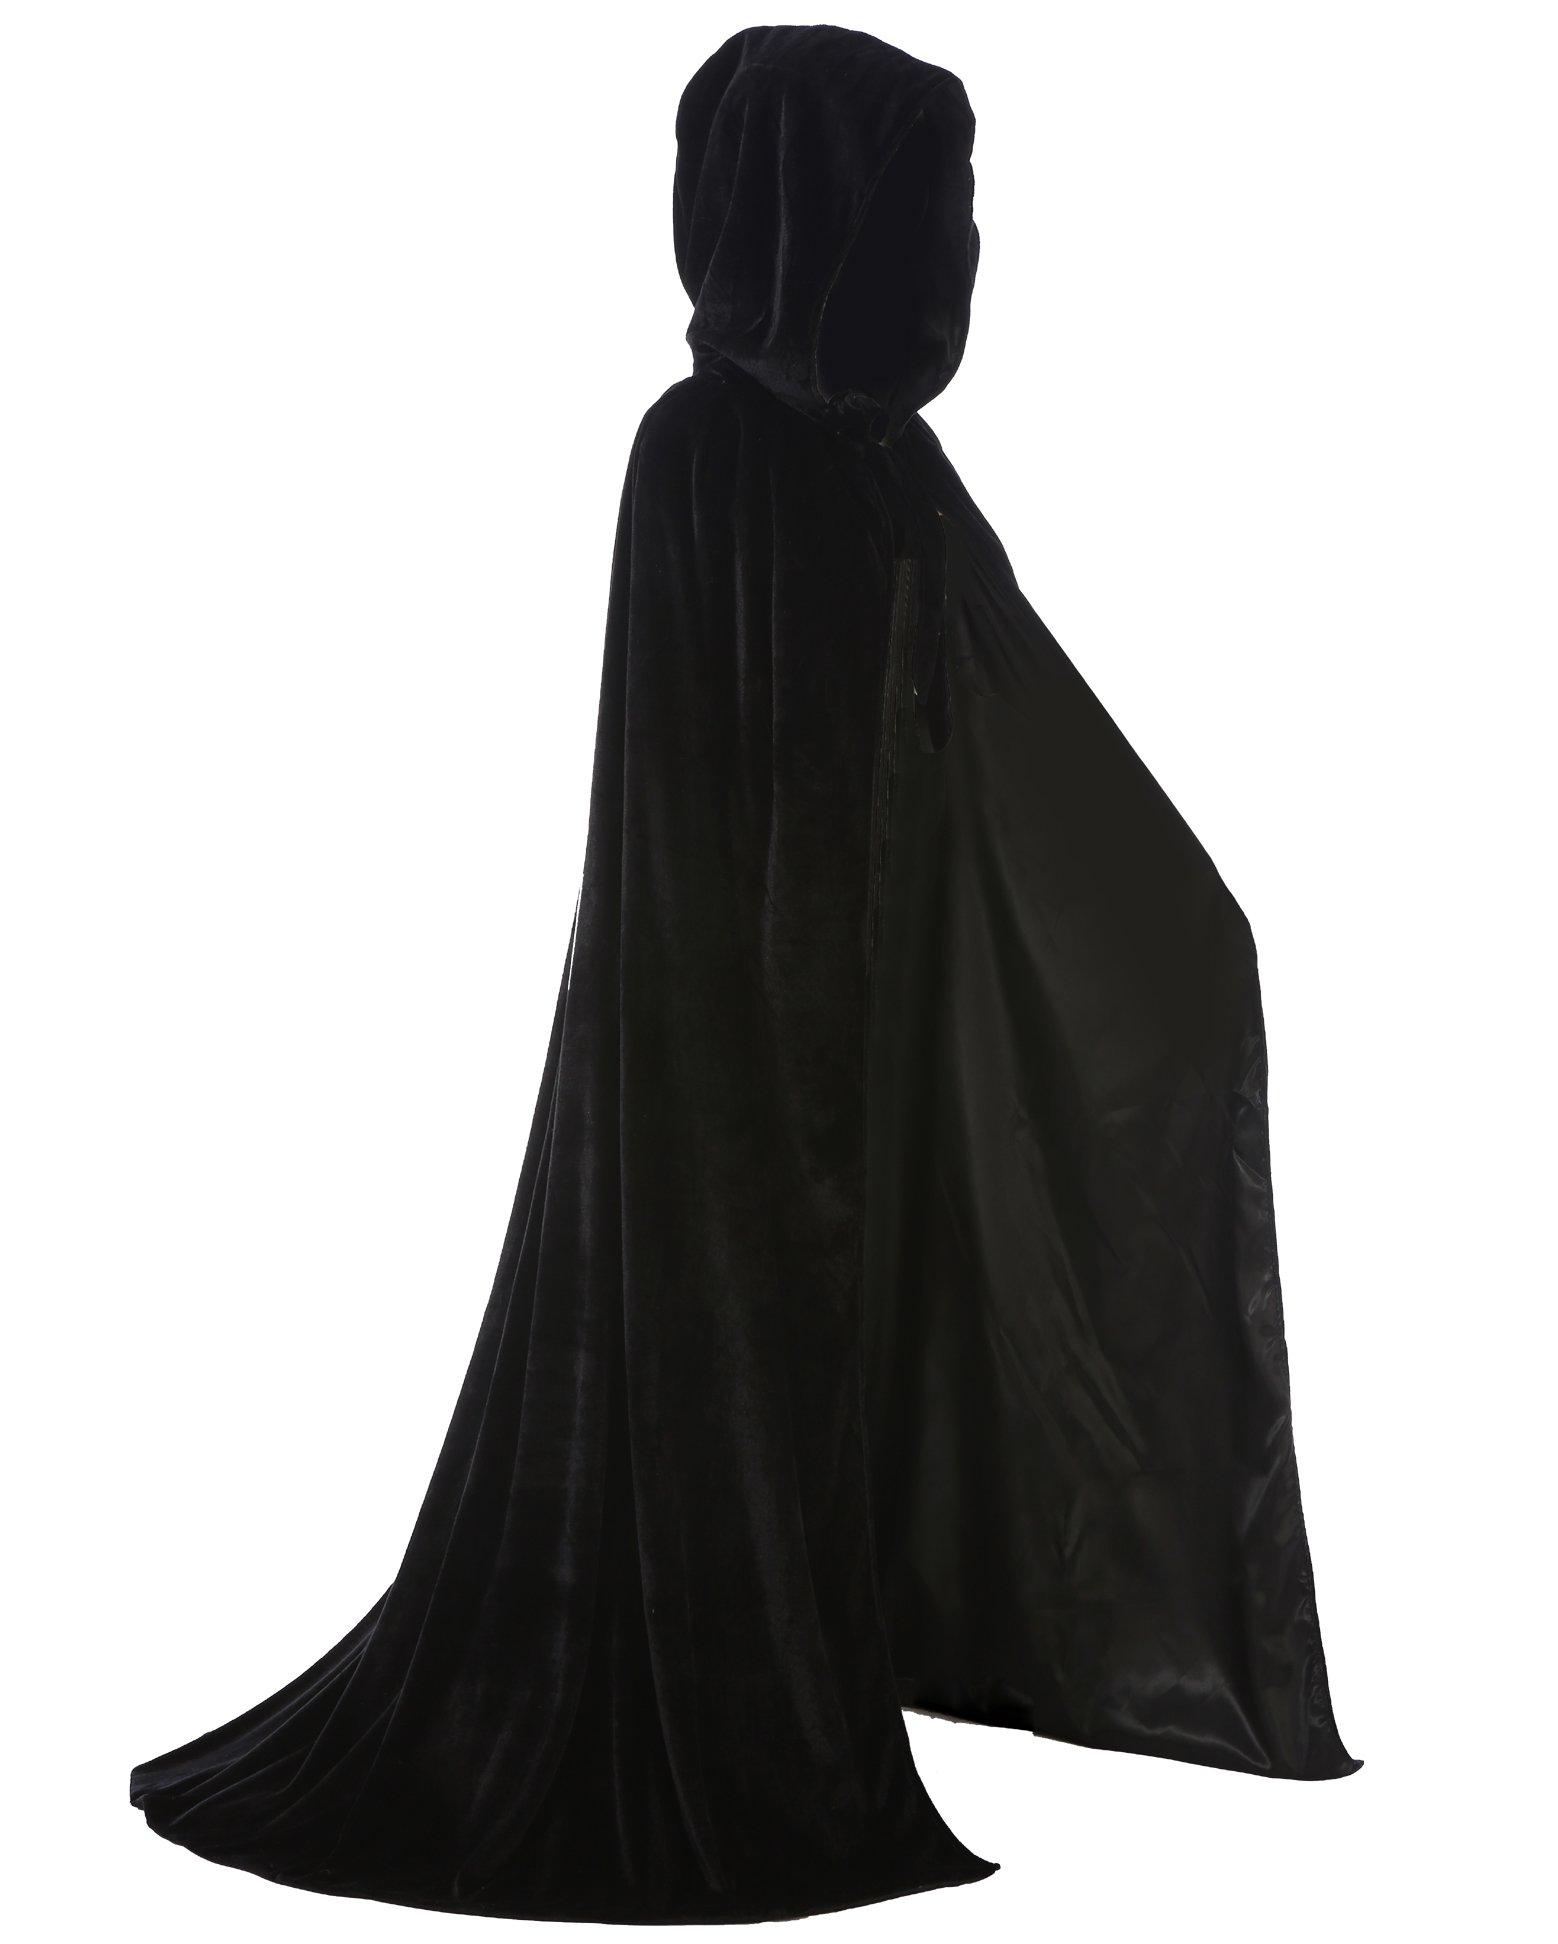 LuckyMjmy Velvet Renaissance Medieval Wedding Cloak Cape Lined with Satin (Small, Black)